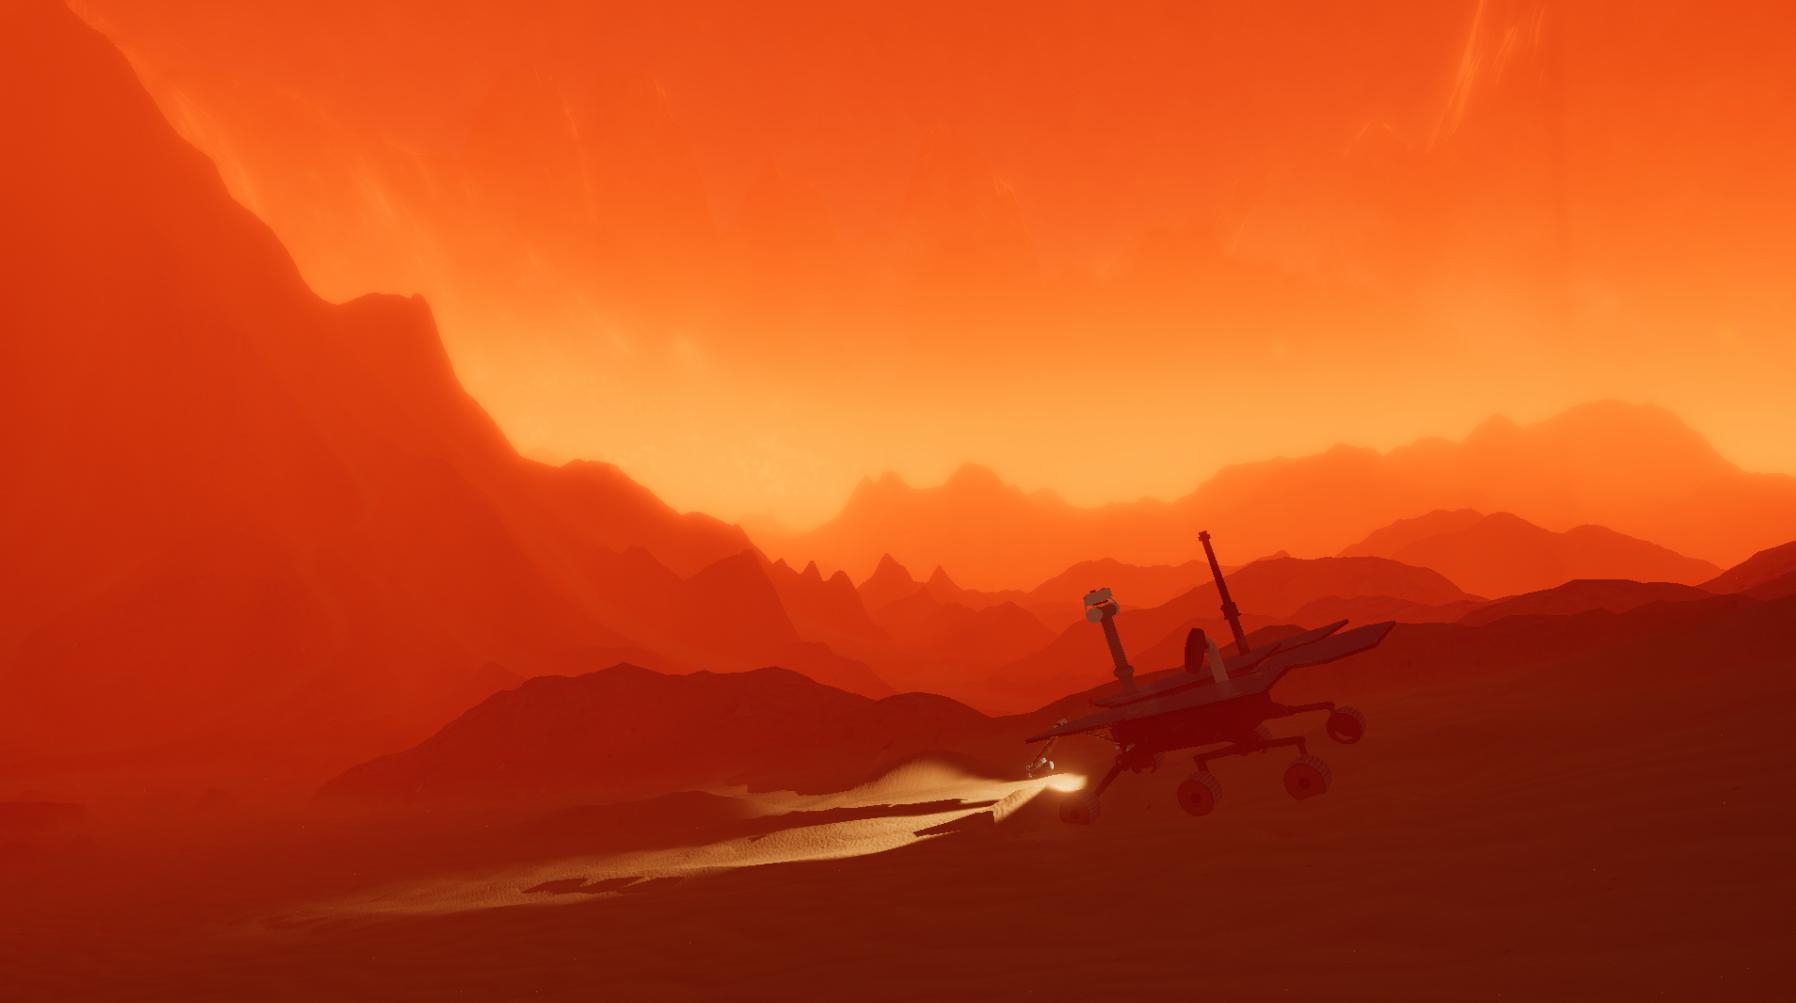 Mars - daytime